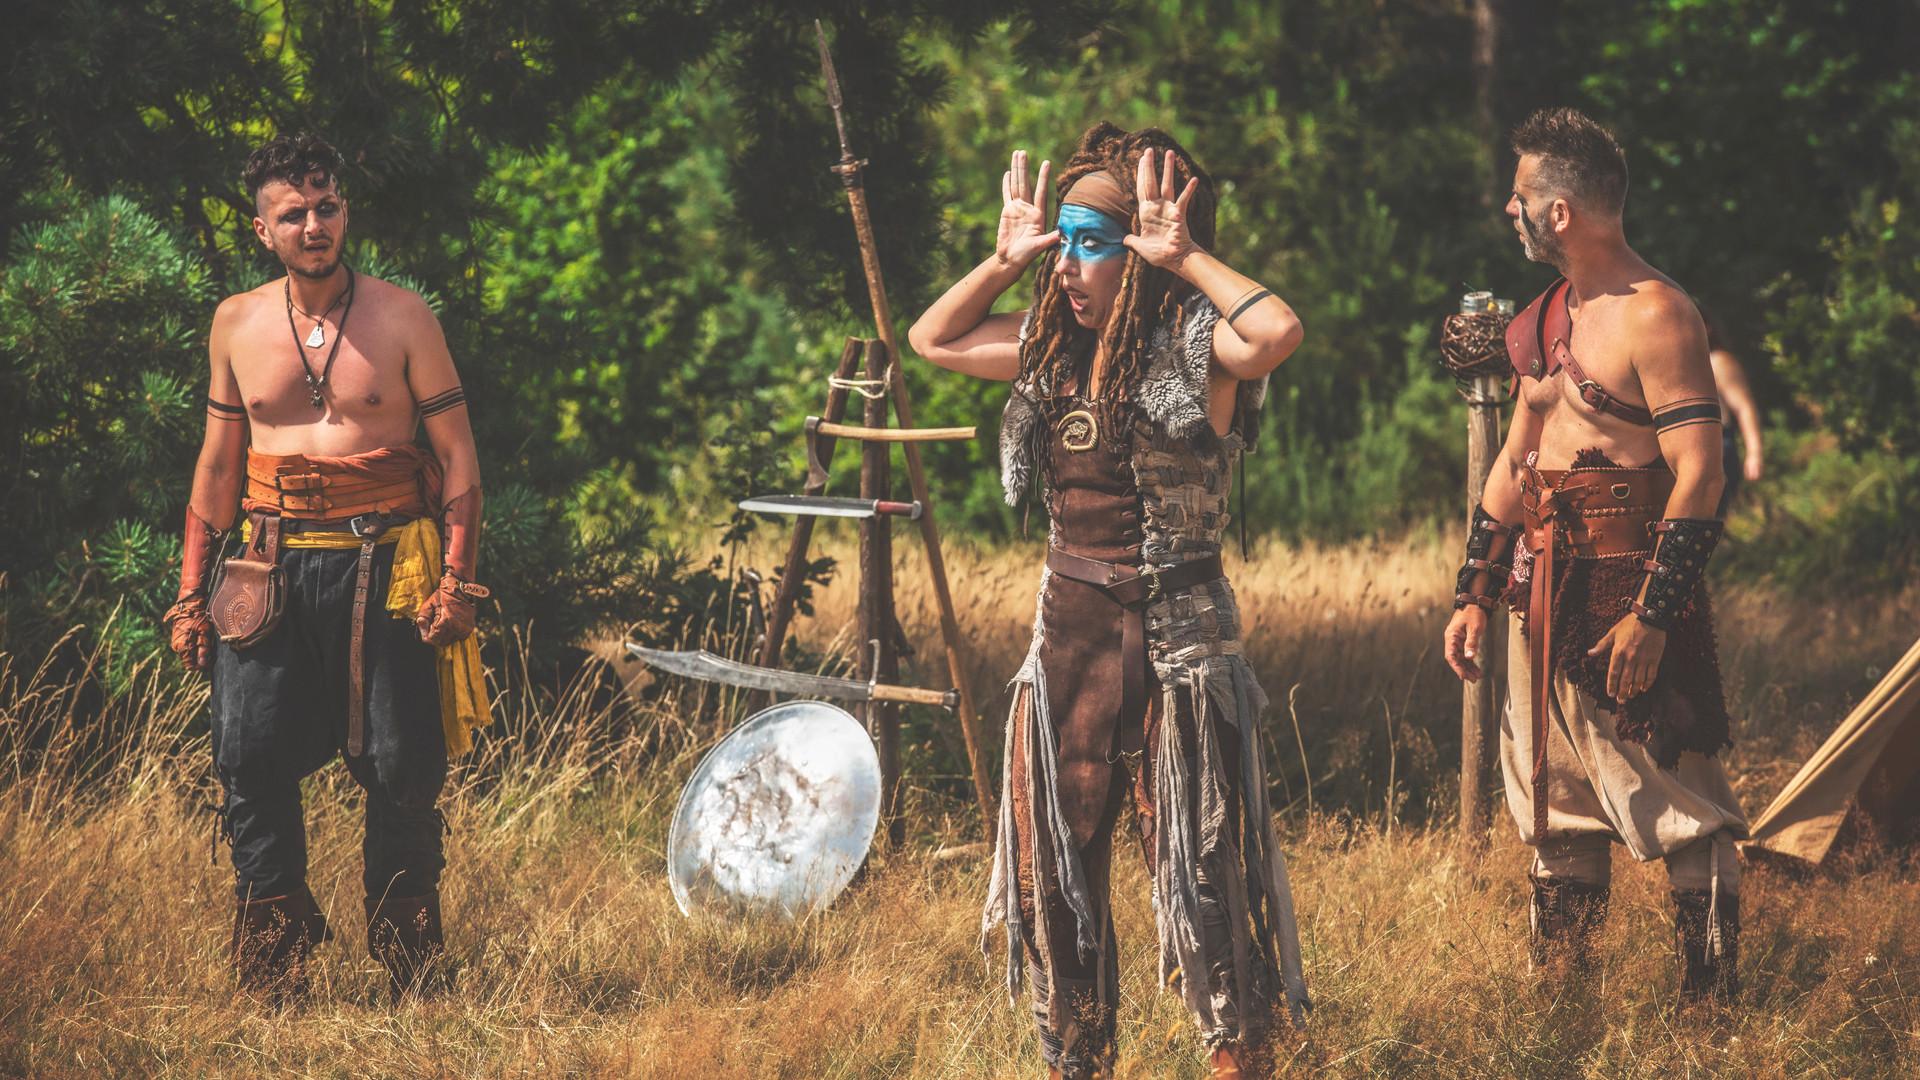 VANDALES! spectacle médiéval - spectacle viking